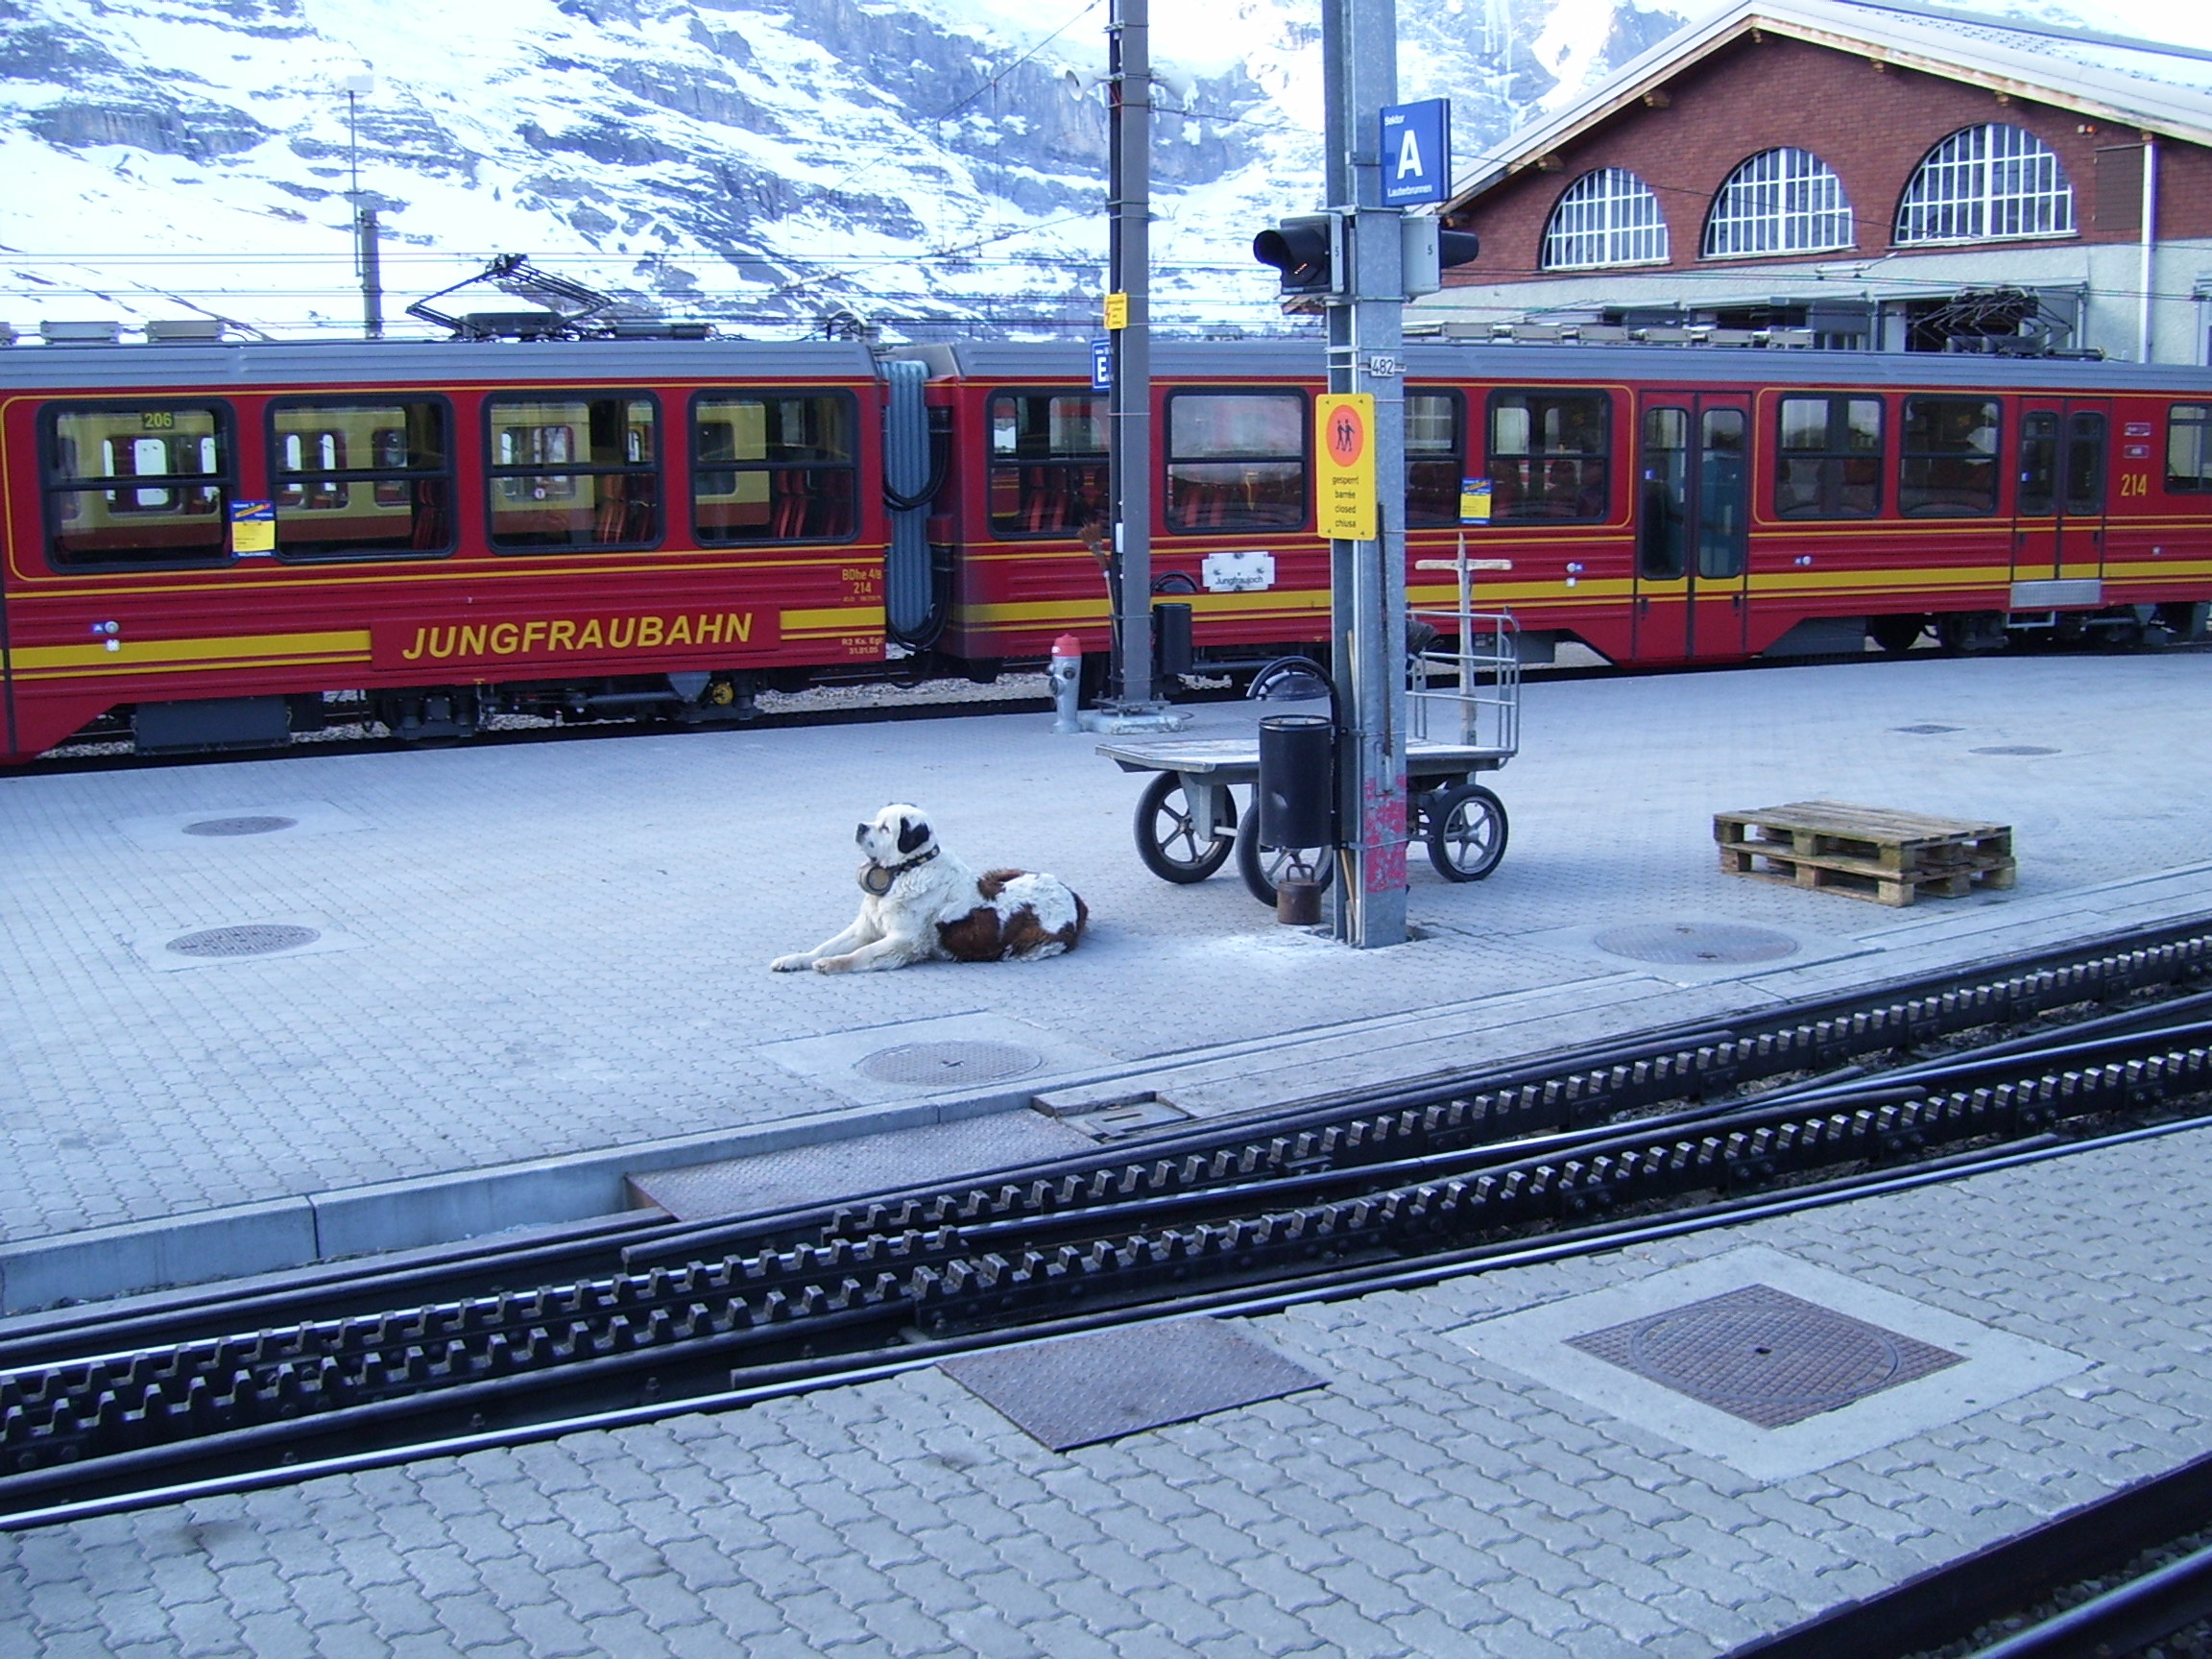 Jungfrau,_Swiss_Alps,_Dog_Station